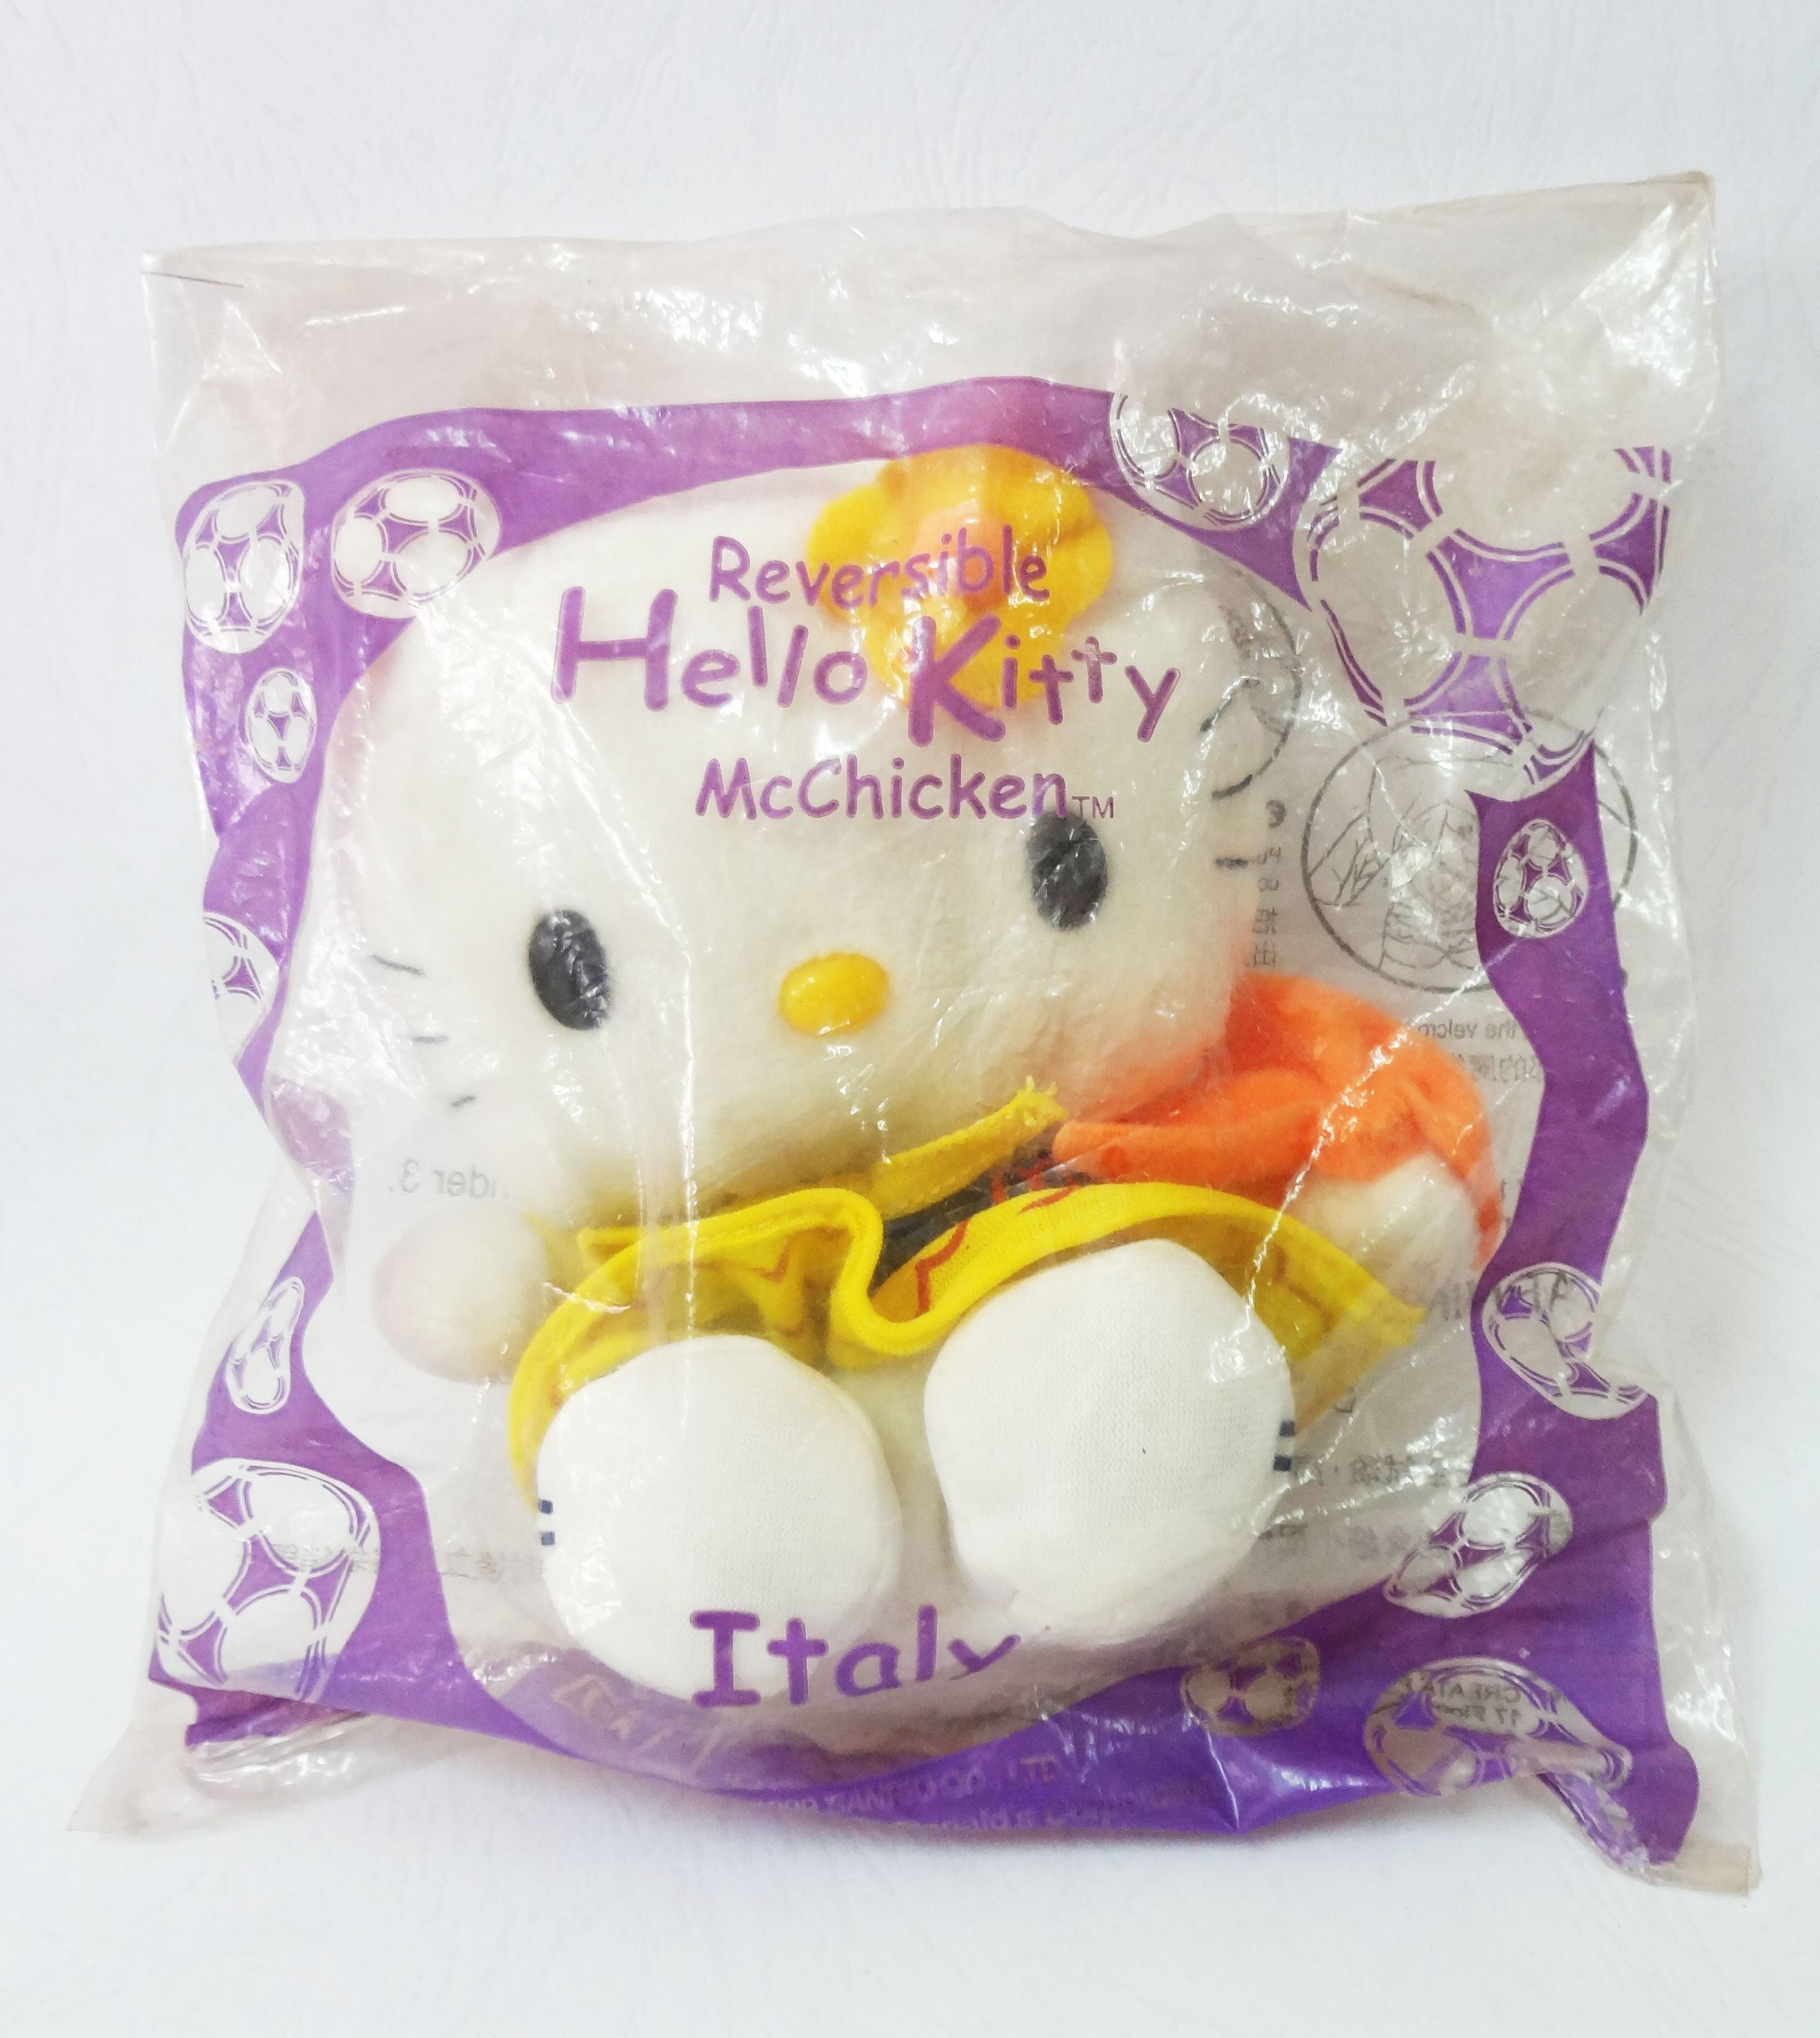 Reversible Hello Kitty-McChicken-Italy